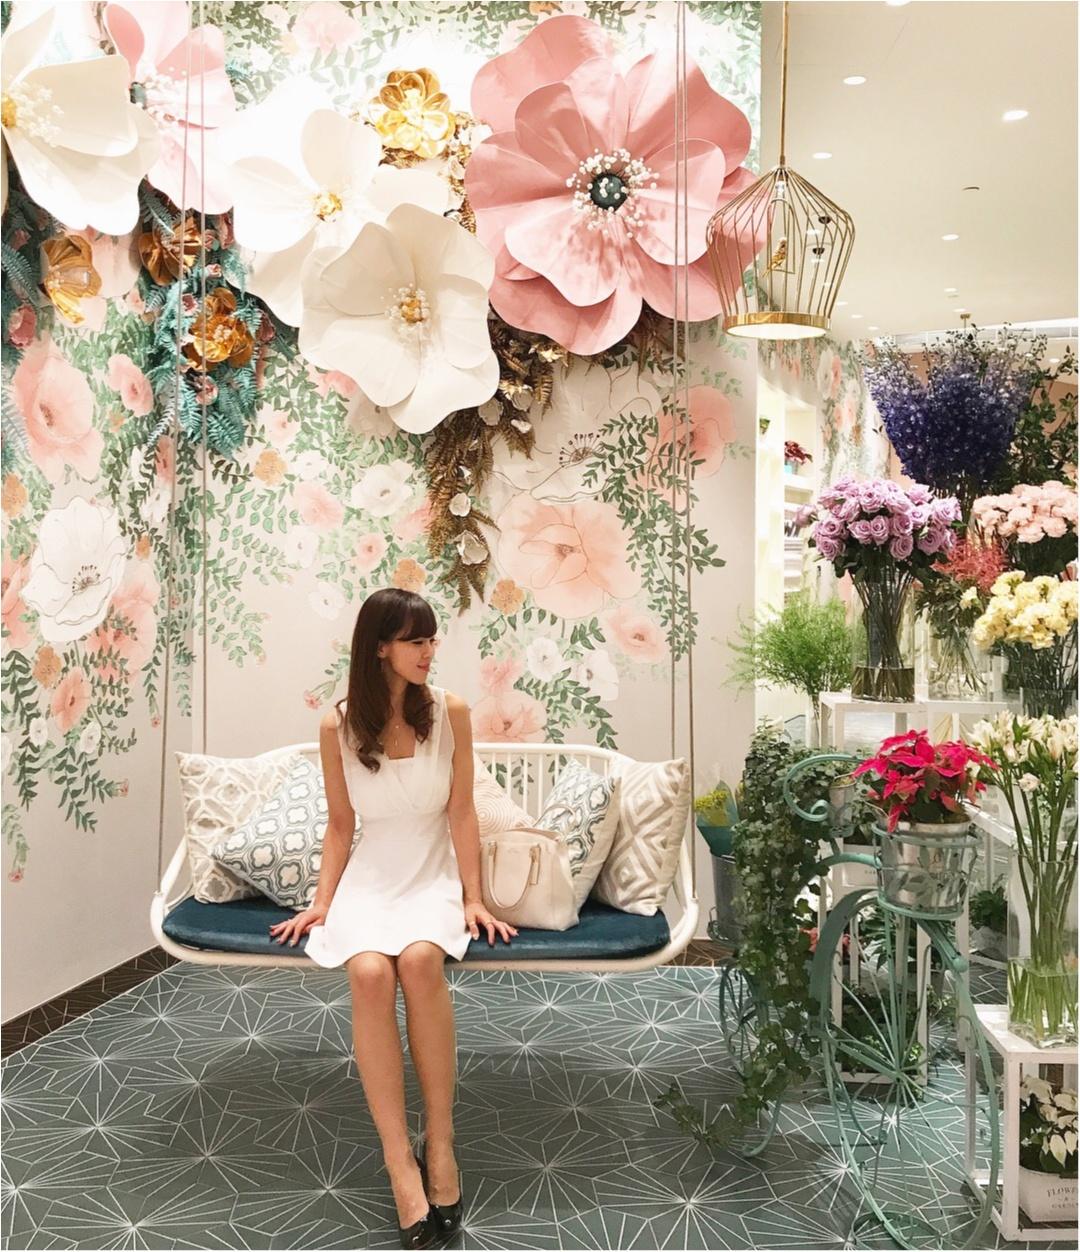 【TRIP】マカオで1番可愛いアフタヌーンティーはココ♡! 絶対にチェックしたい #Cha Bei ♡in GALAXY Macau_1